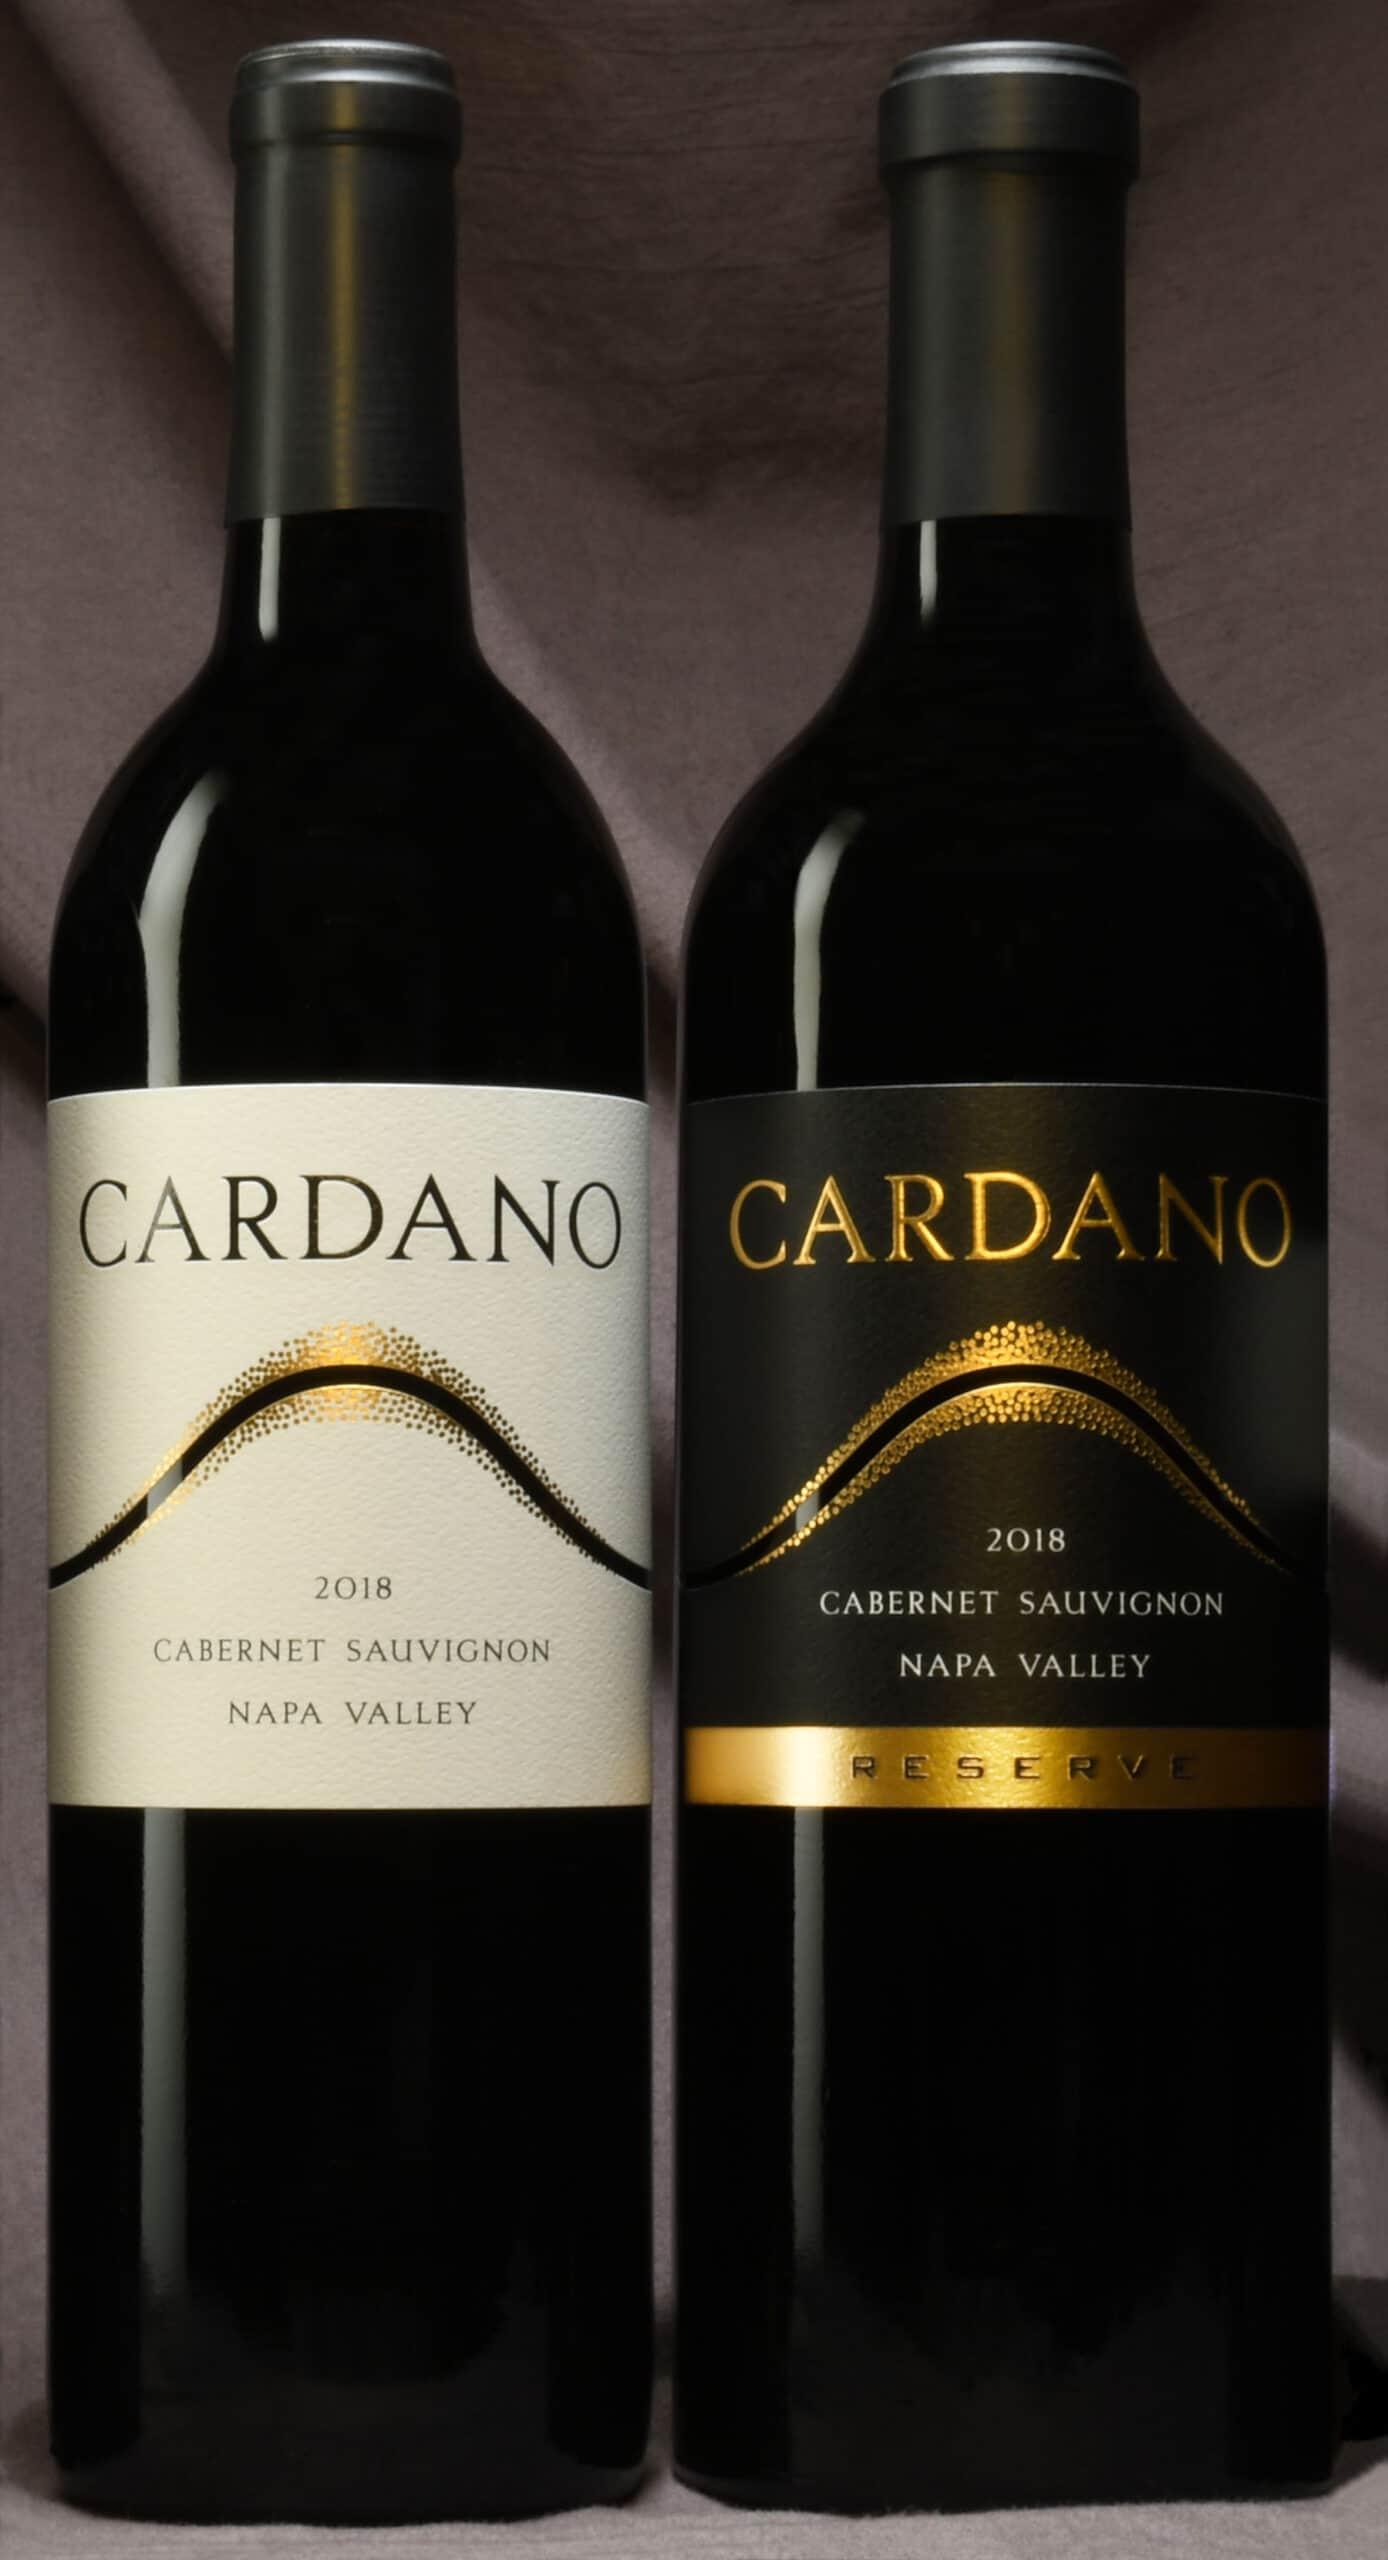 Cardano Cabernet Sauvignon wine bottles